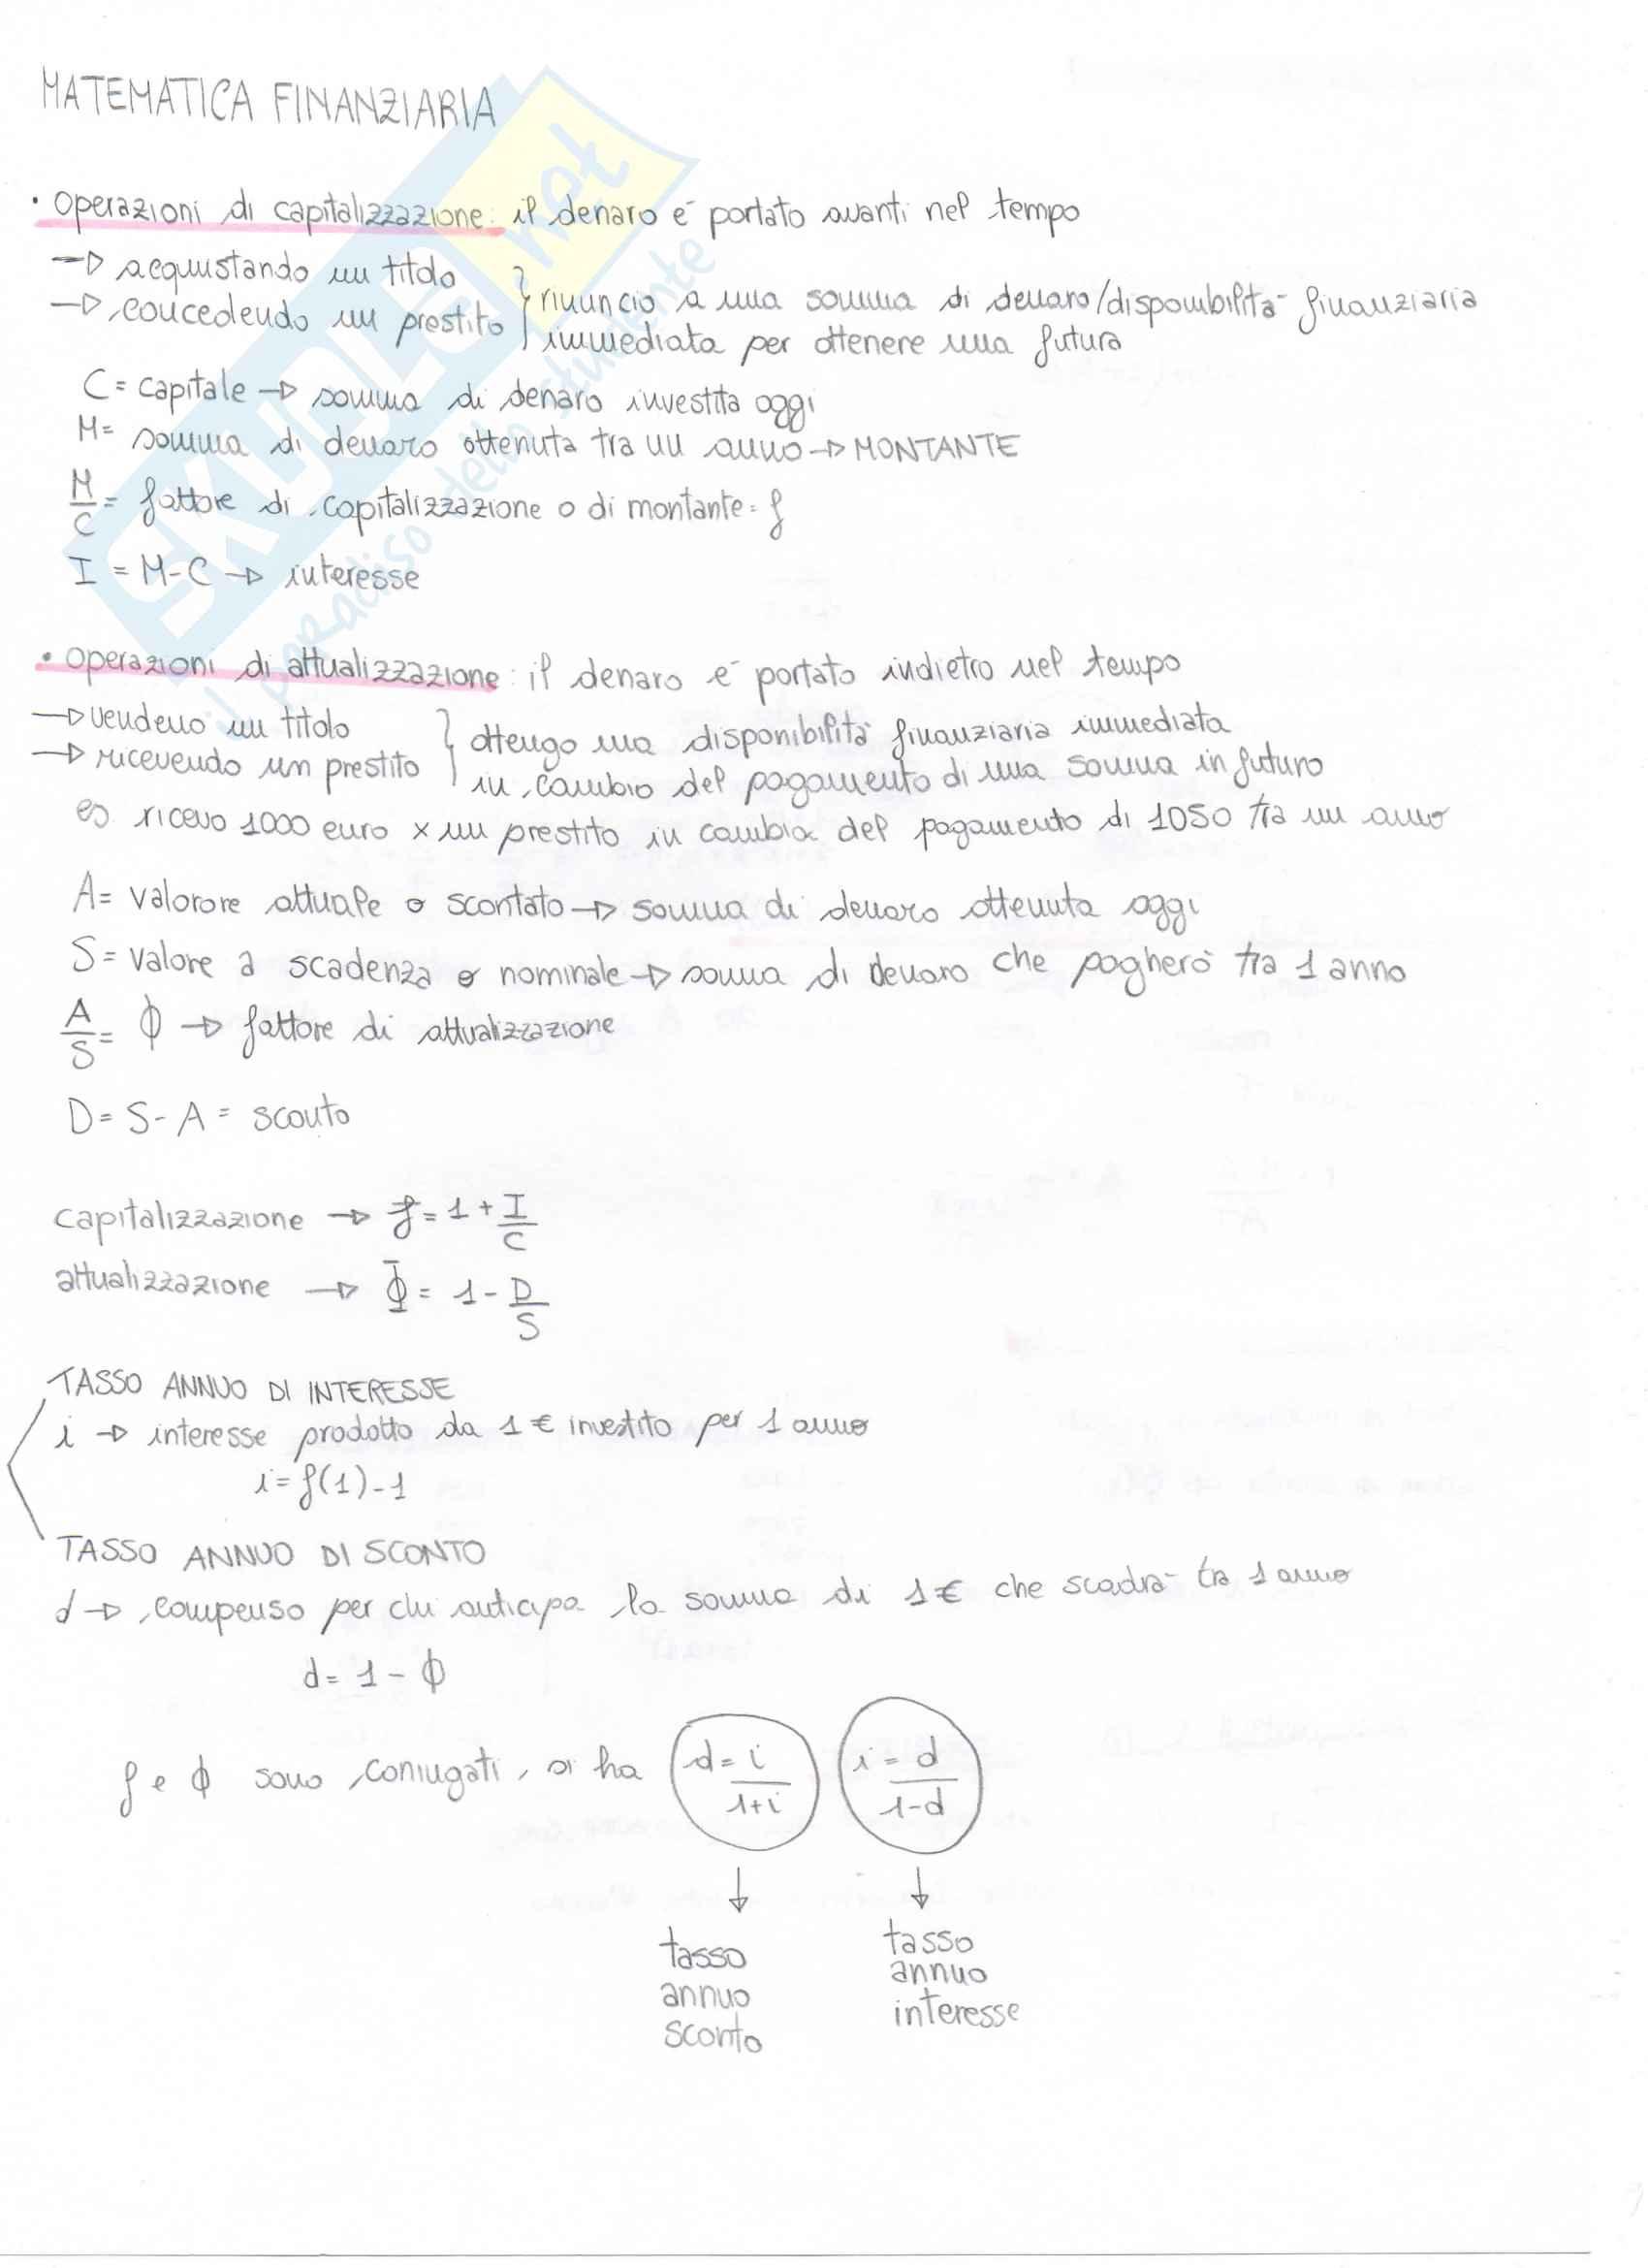 Teoria di matematica generale e finanziaria